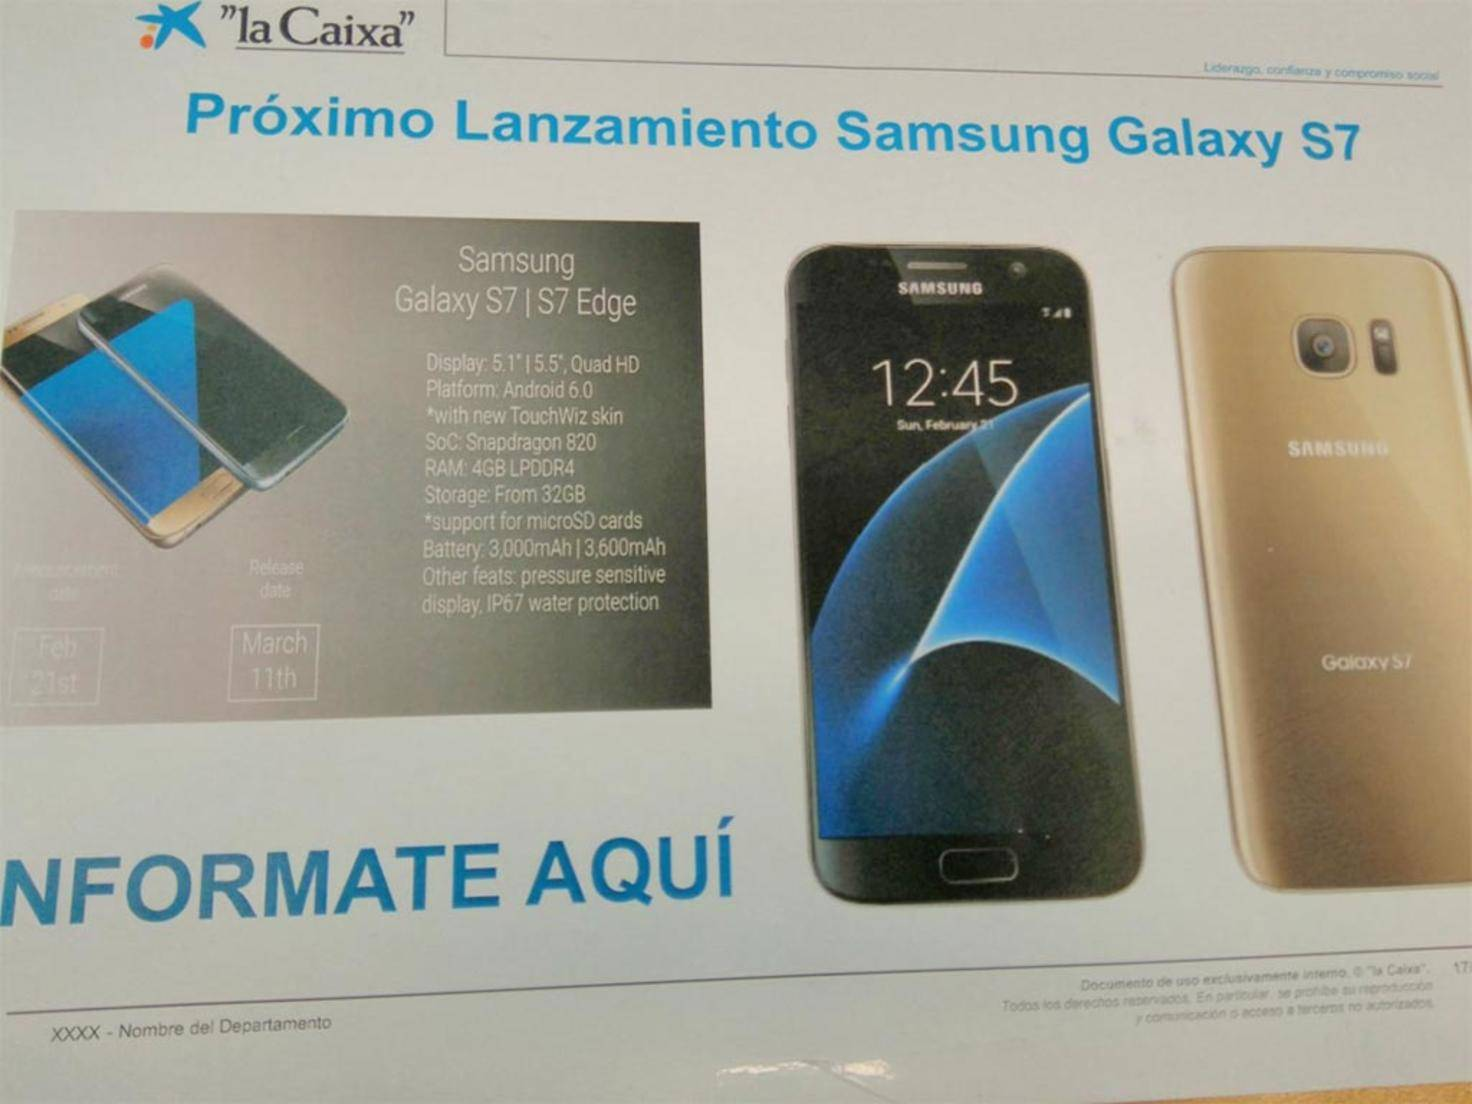 Galaxy-S7-Promoleak